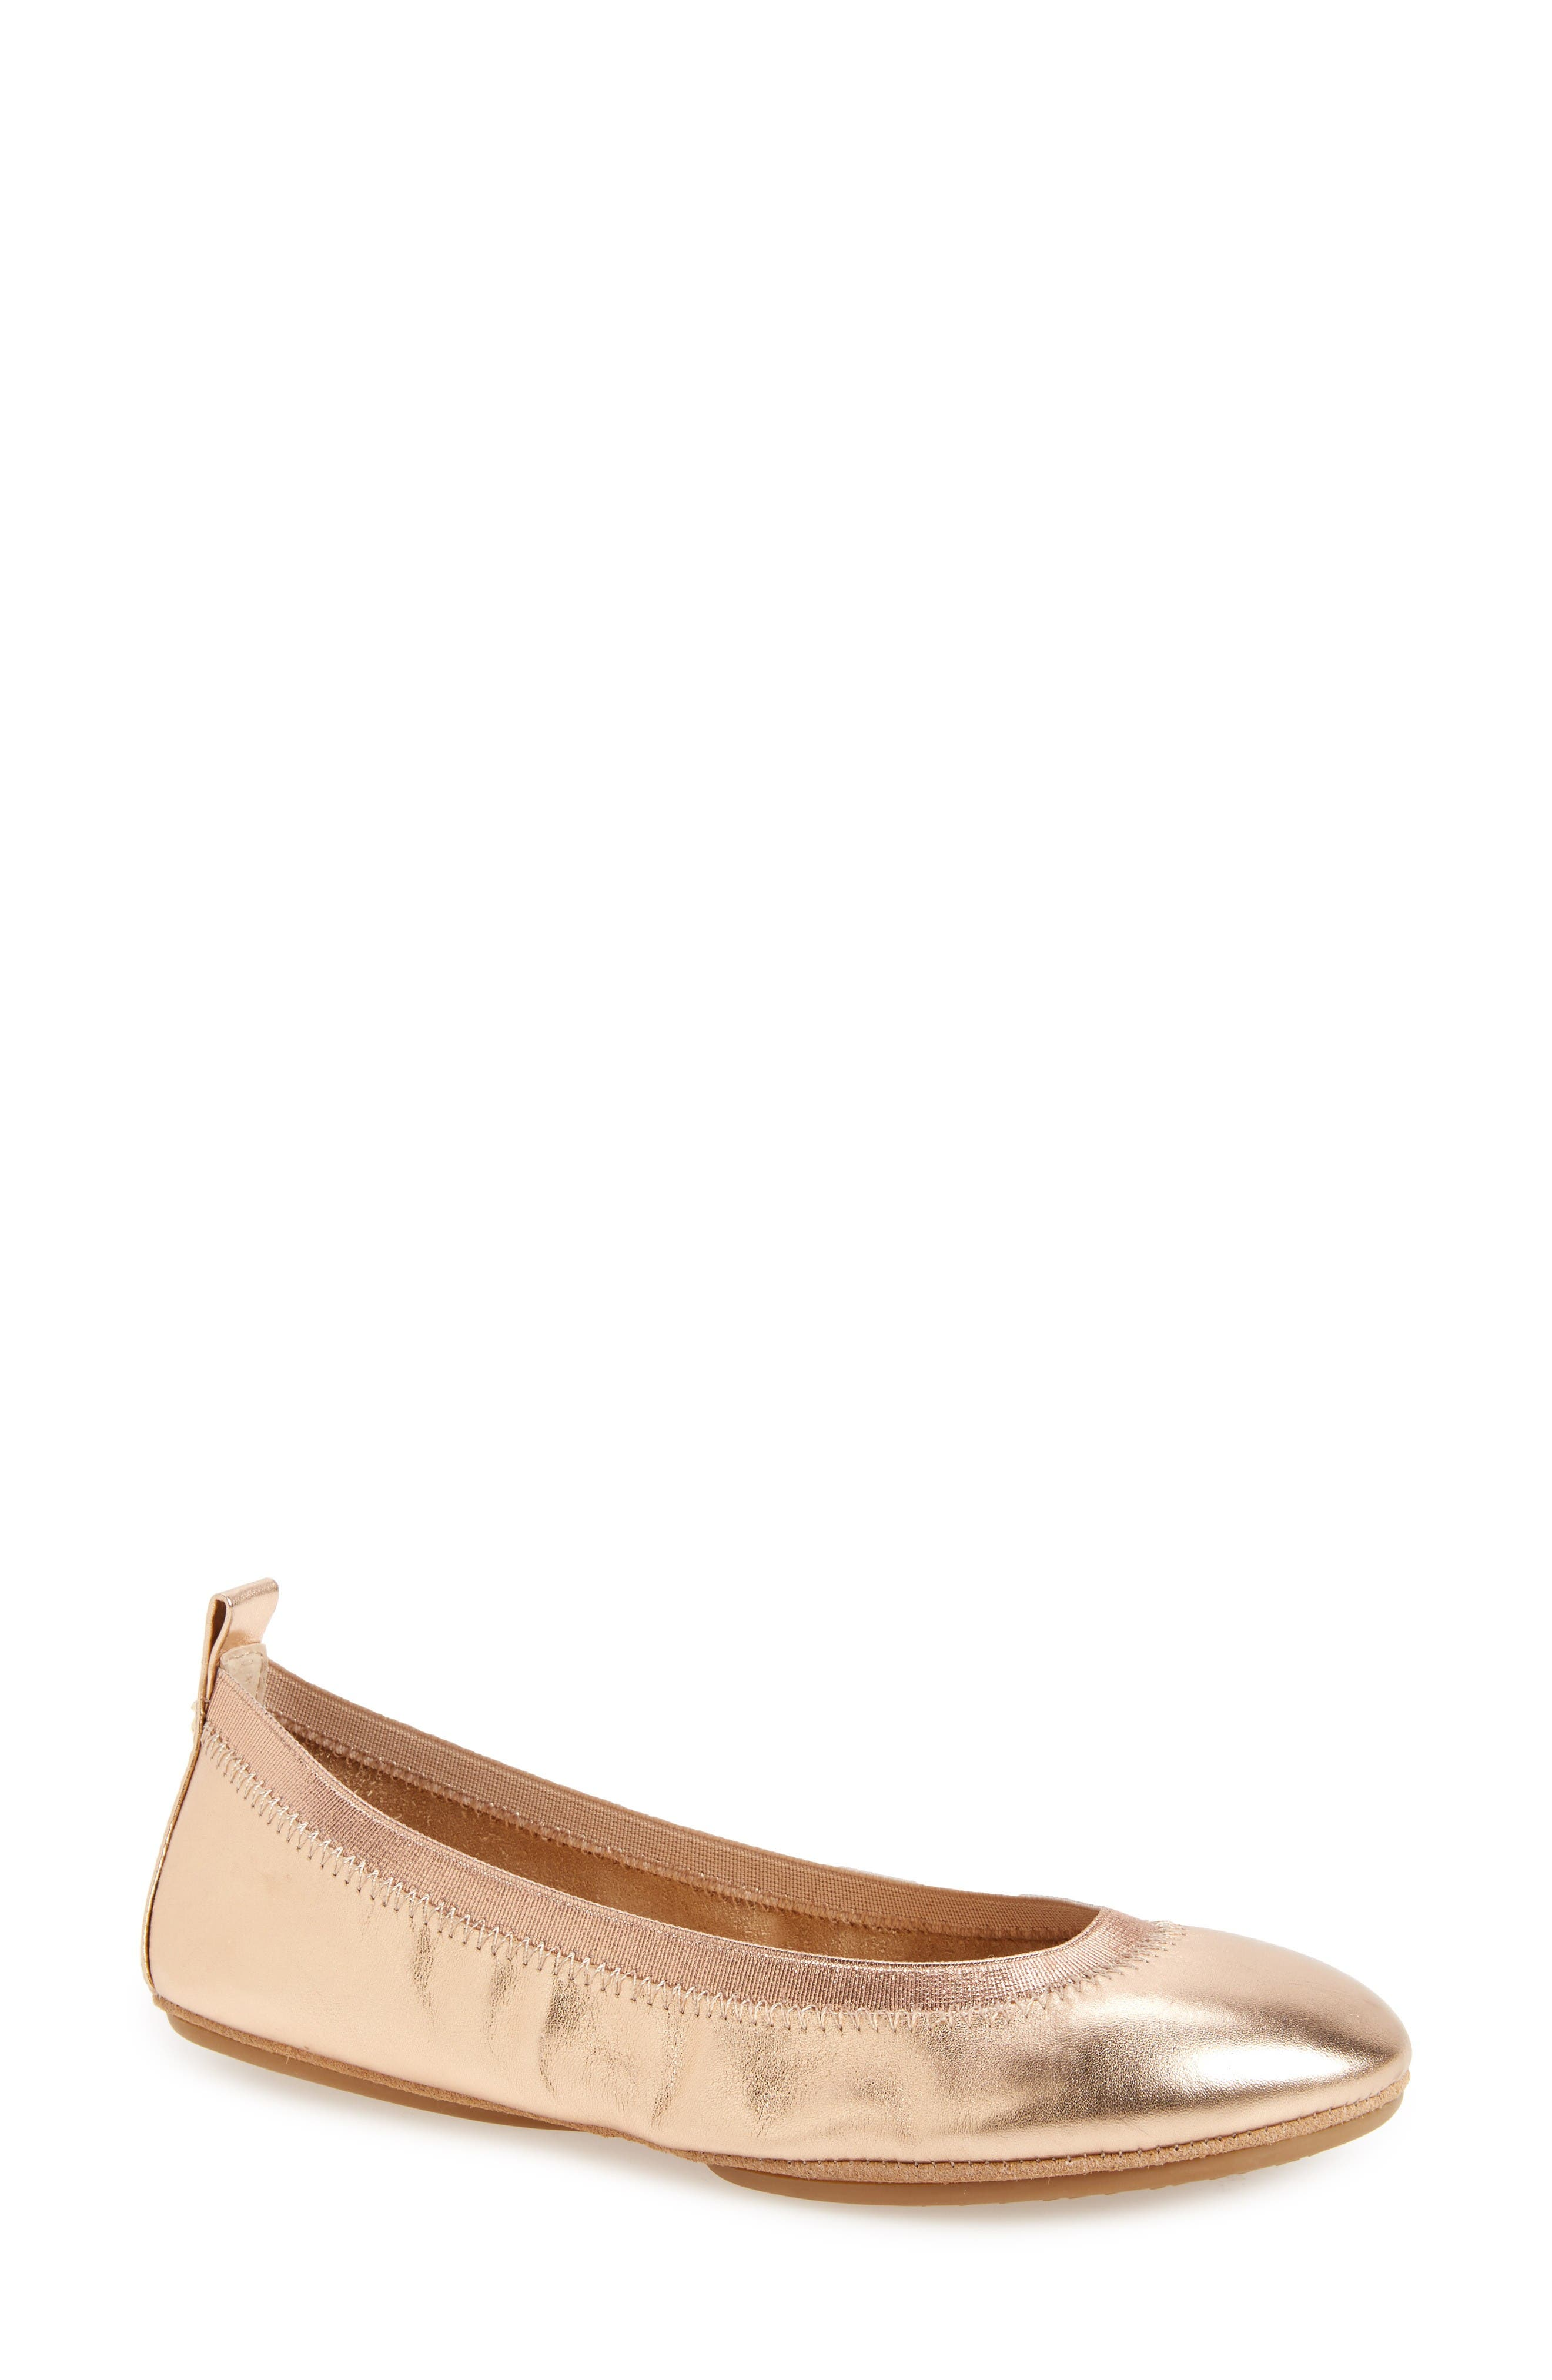 Samara 2.0 Foldable Ballet Flat,                             Main thumbnail 1, color,                             Rose Gold Leather